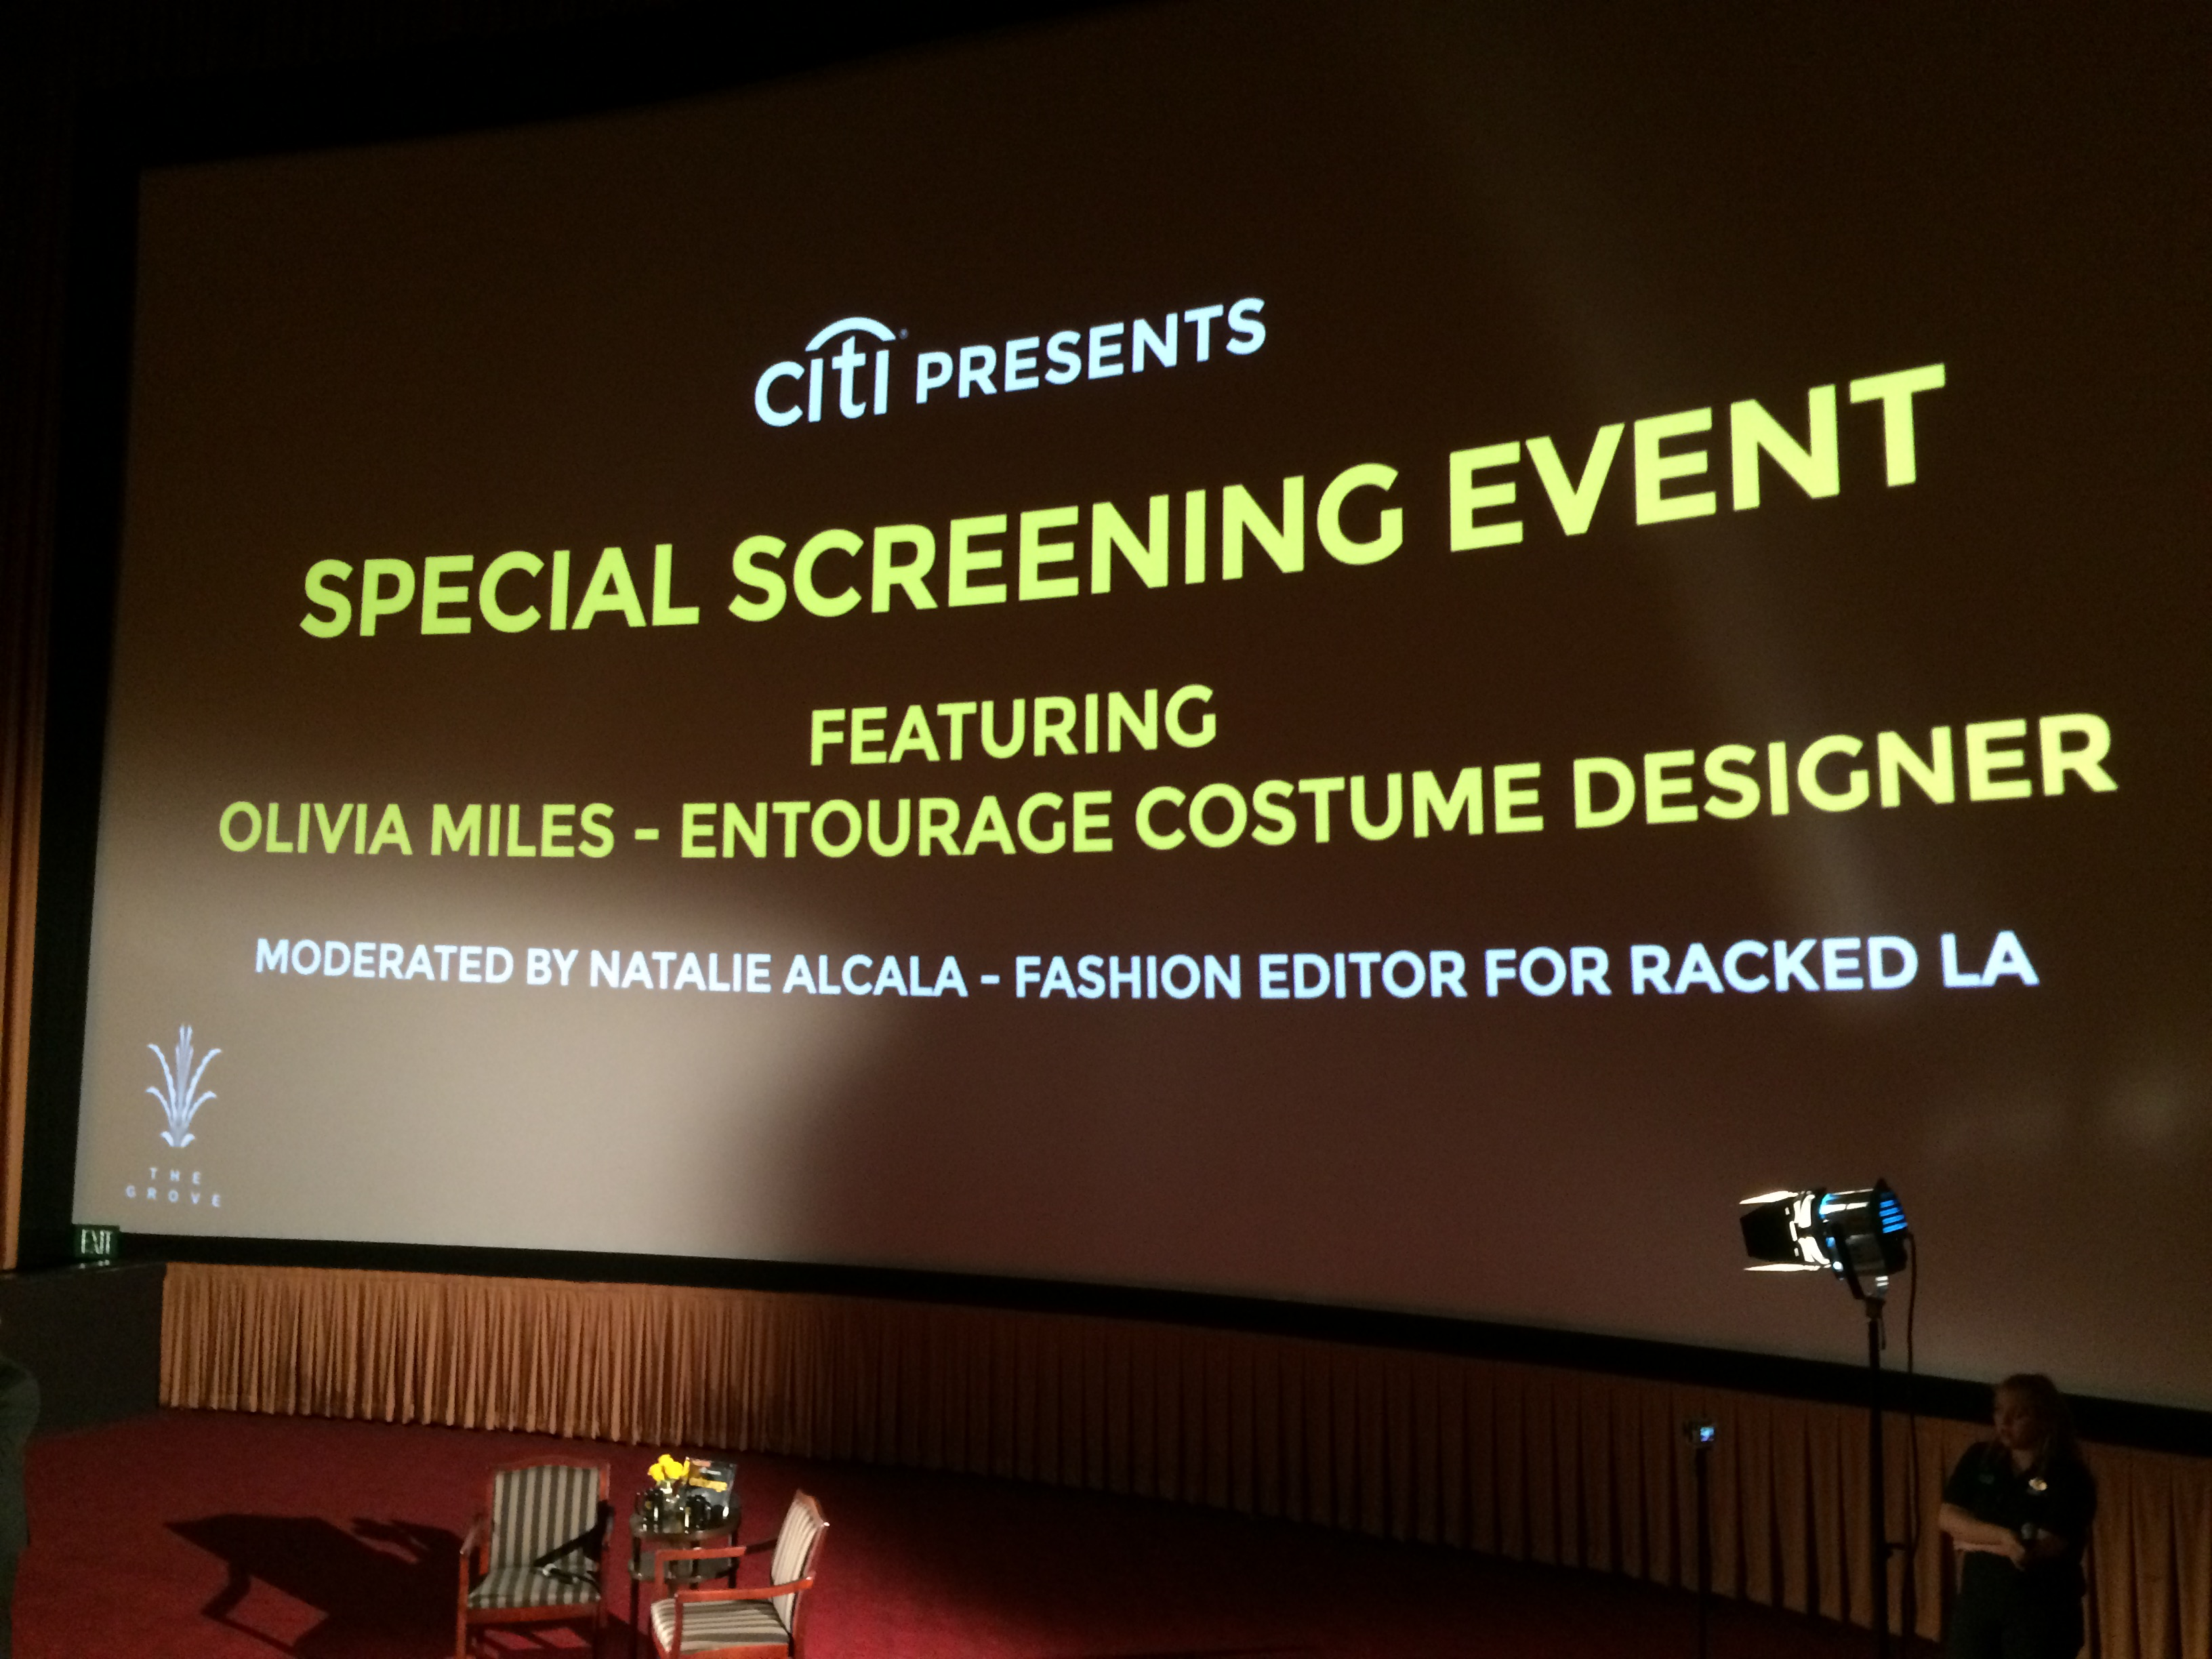 Racked La Entourage Costume Designer Olivia Miles On Dressing The Cast